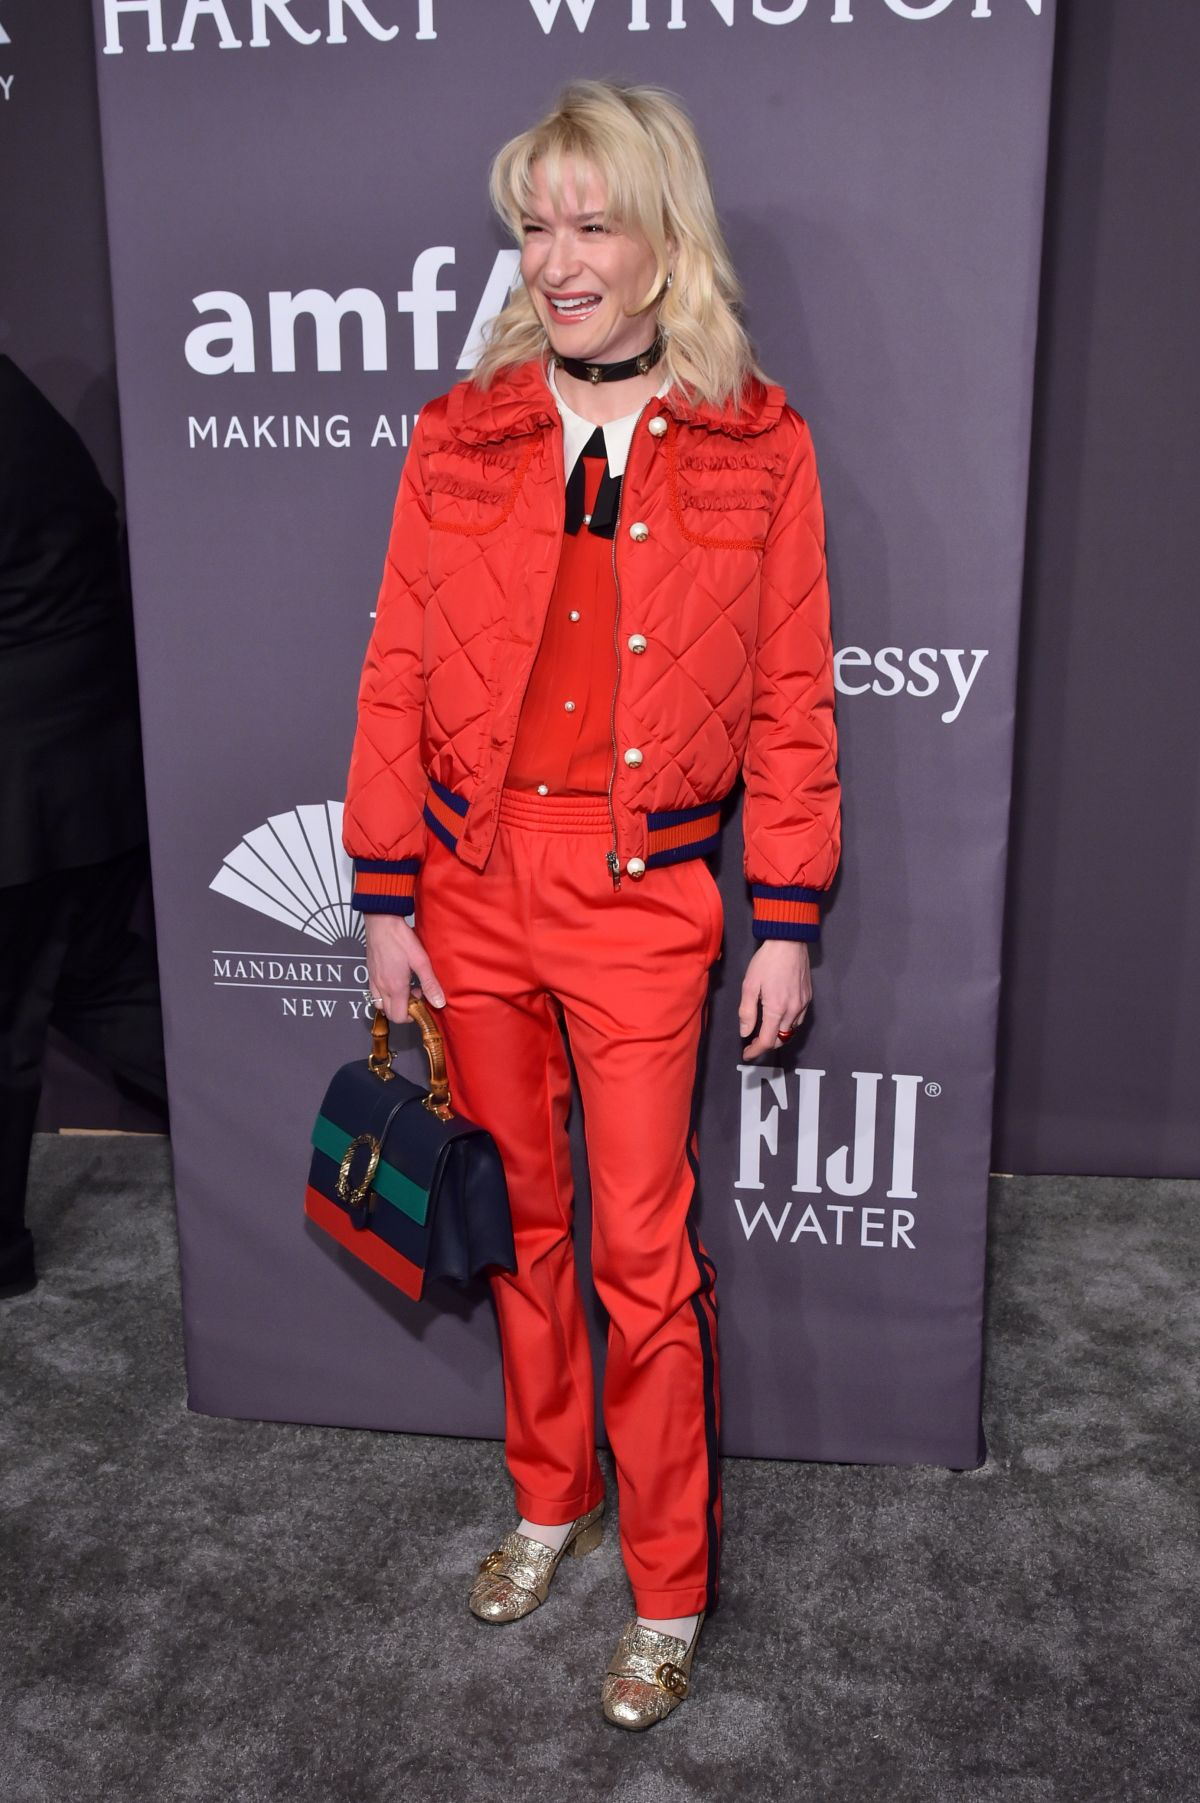 JULIE MACKLOWE at AMFAR 2017 New York Gala 02/08/2017